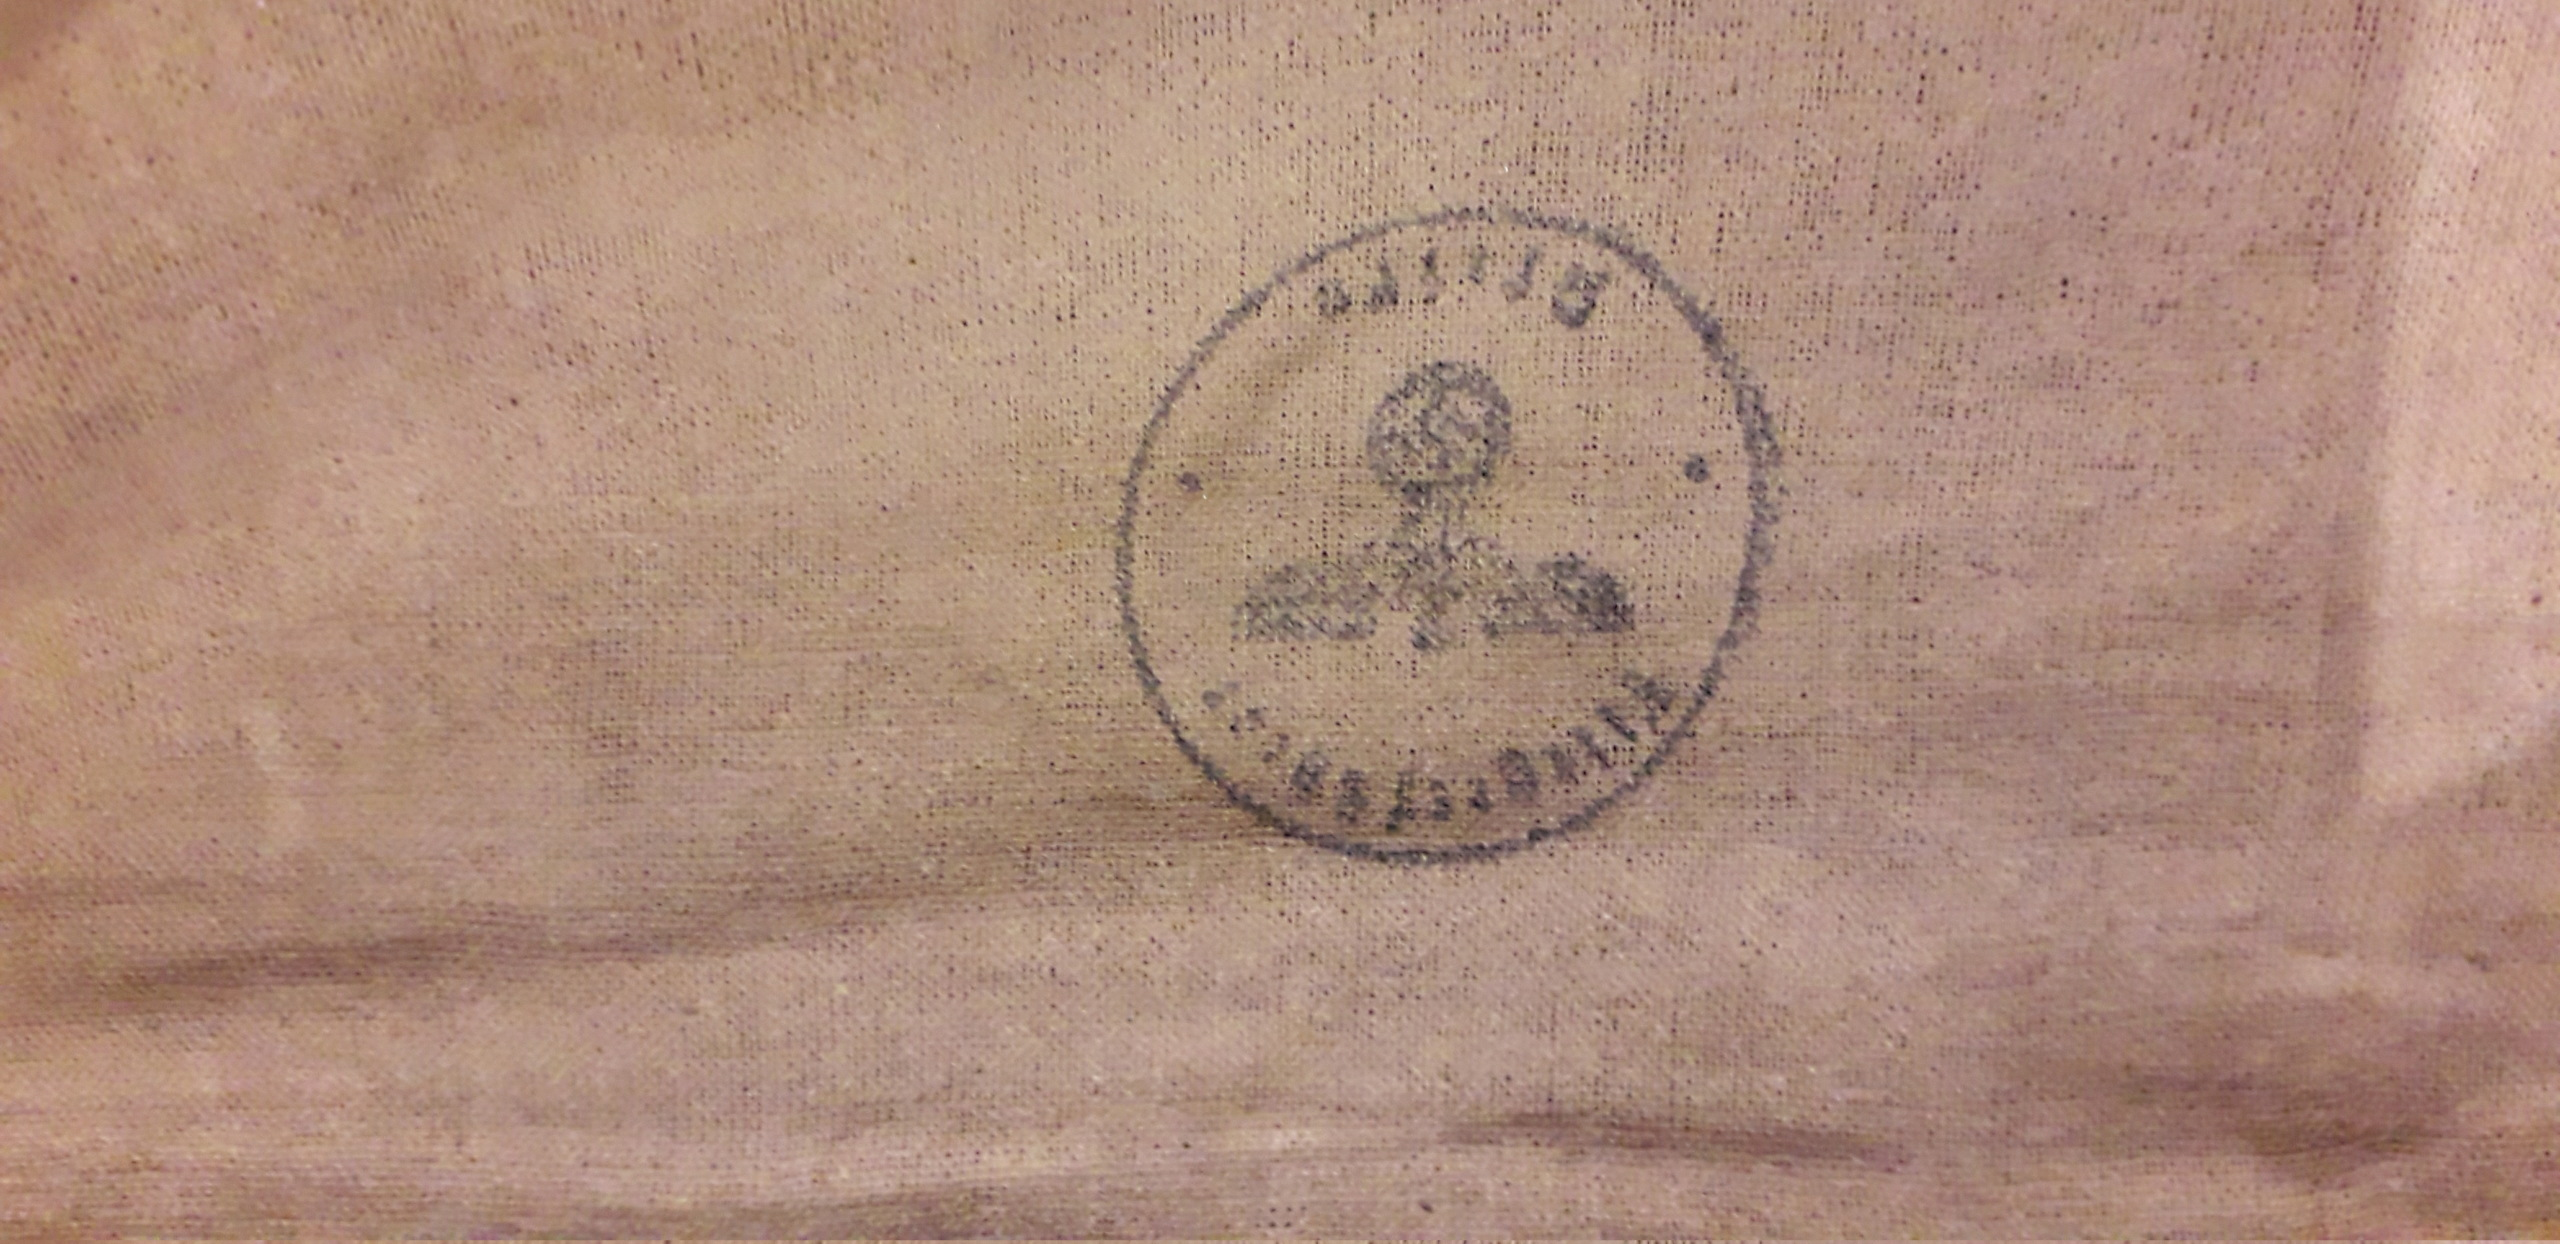 Tampon  Allemand dans sac médical français 1940 20200724